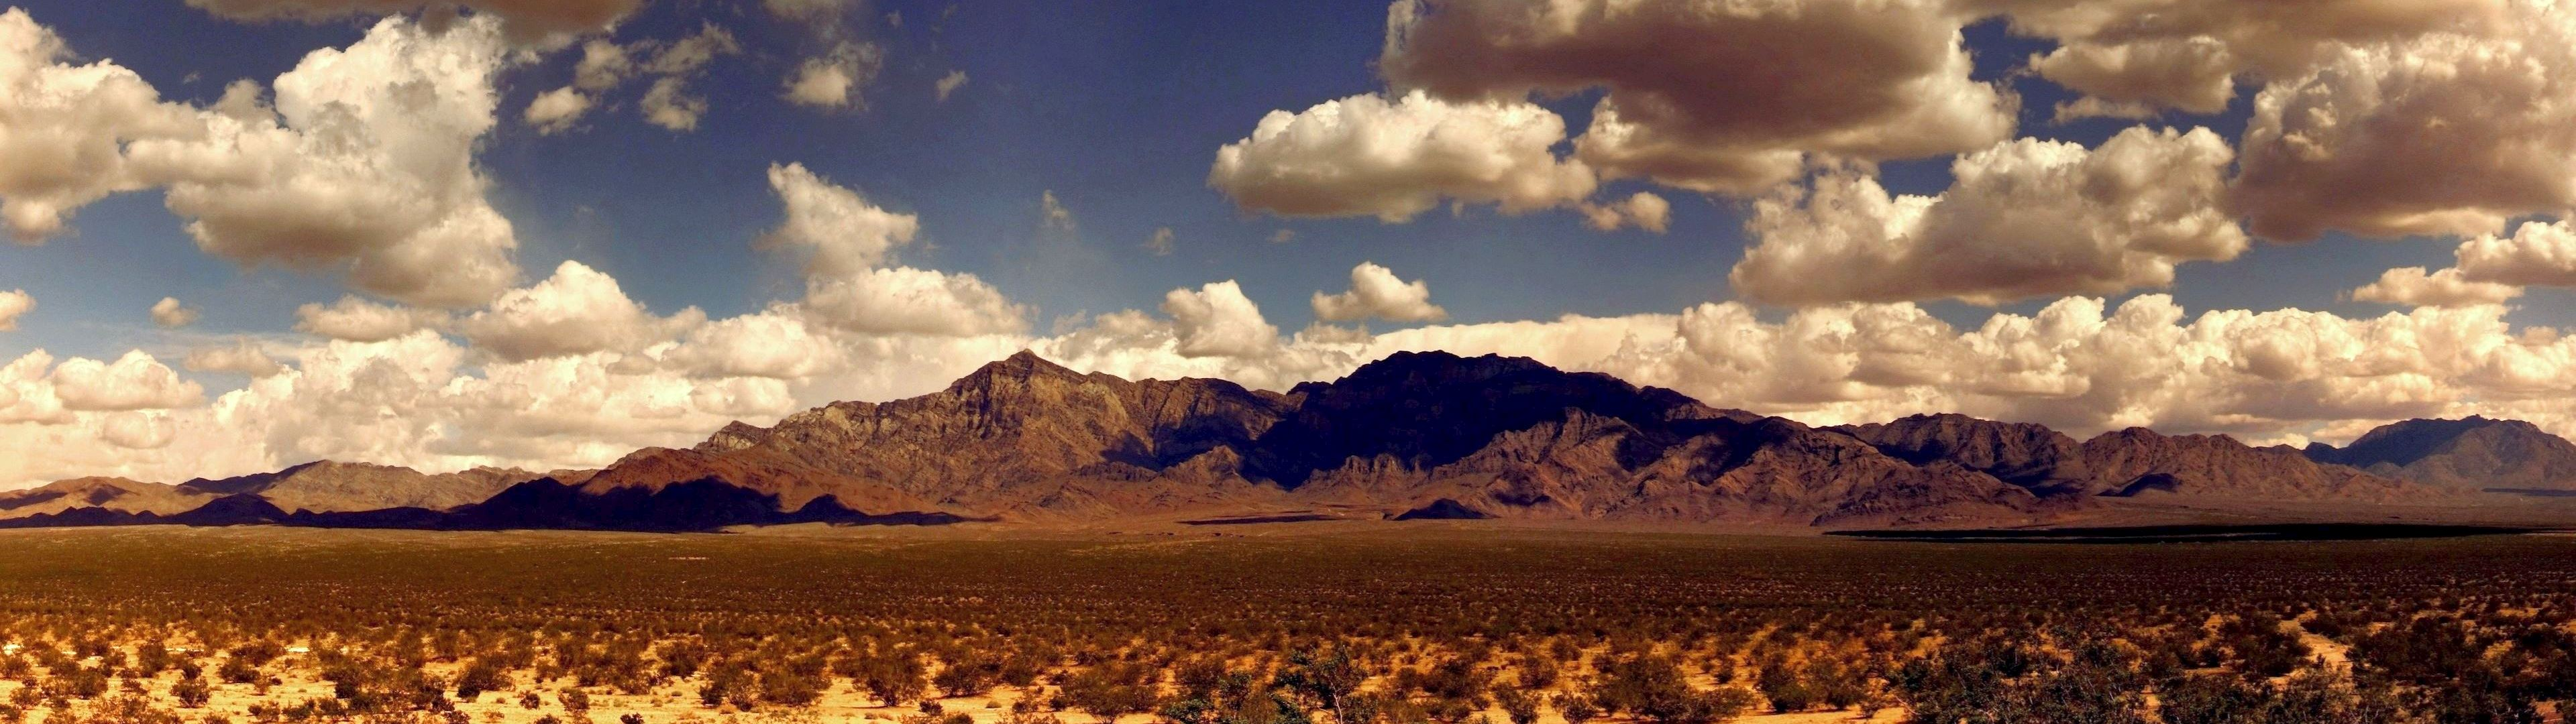 WallpaperFusion-desert-mountain-Original-3840x2160.jpg